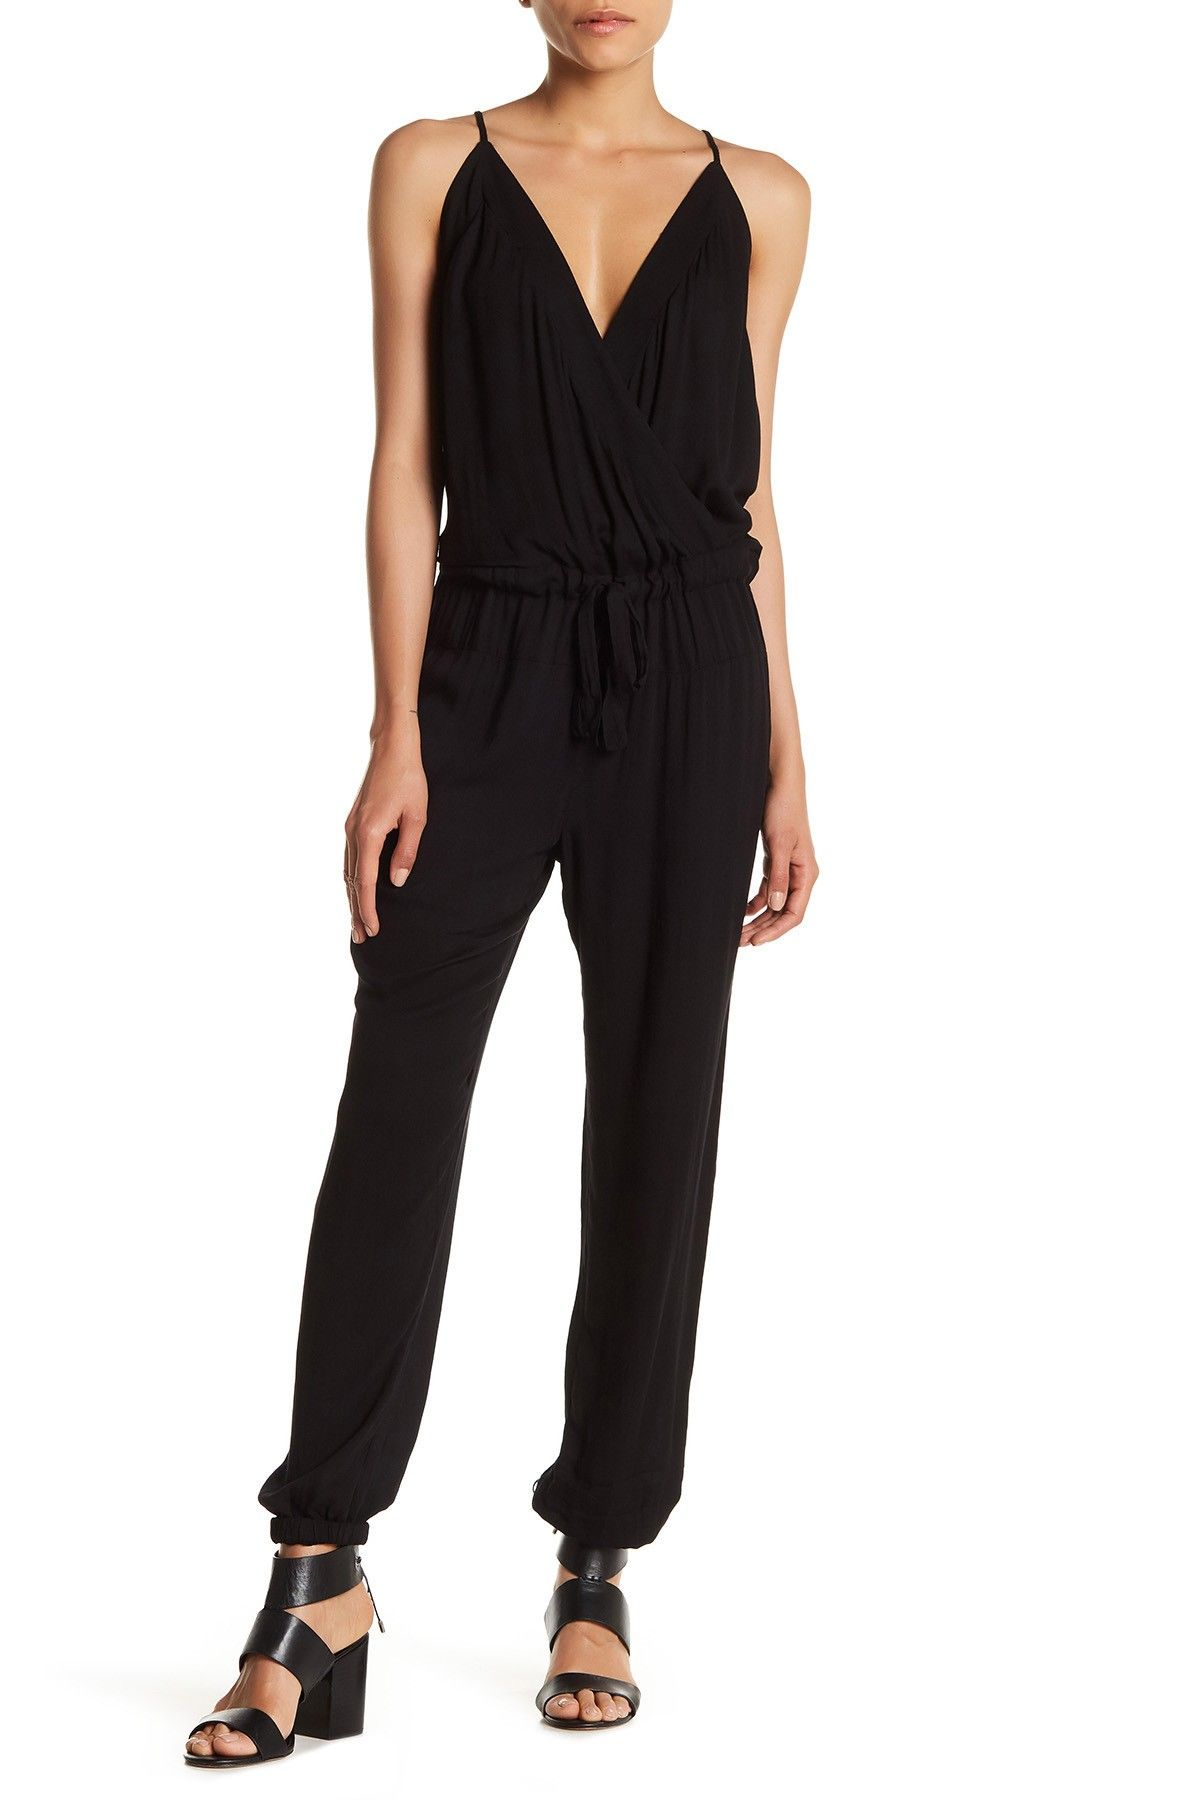 cbce0e847848 YFB Clothing - Rodney Solid Jumpsuit